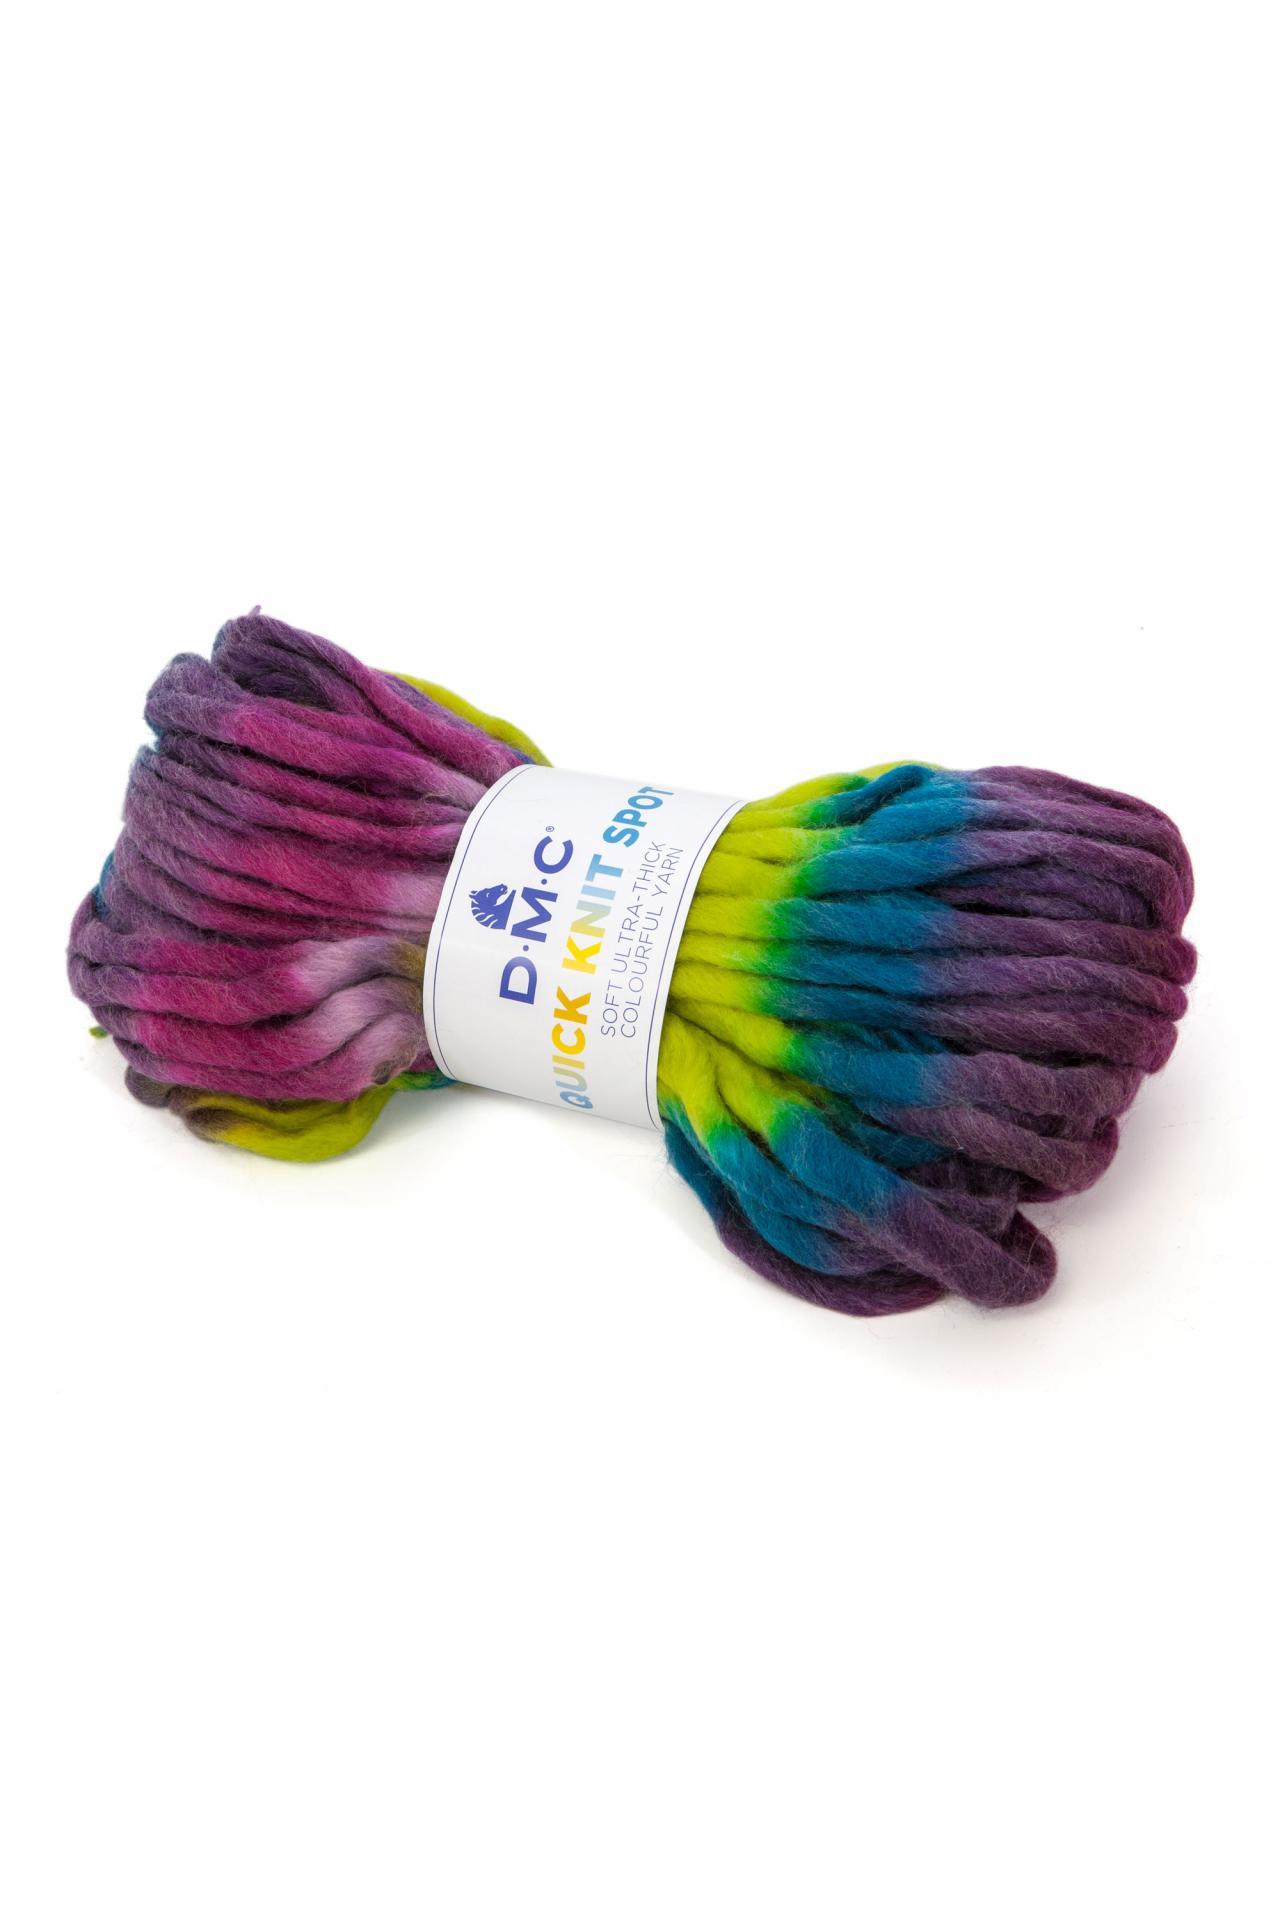 Quick Knit Spot 700